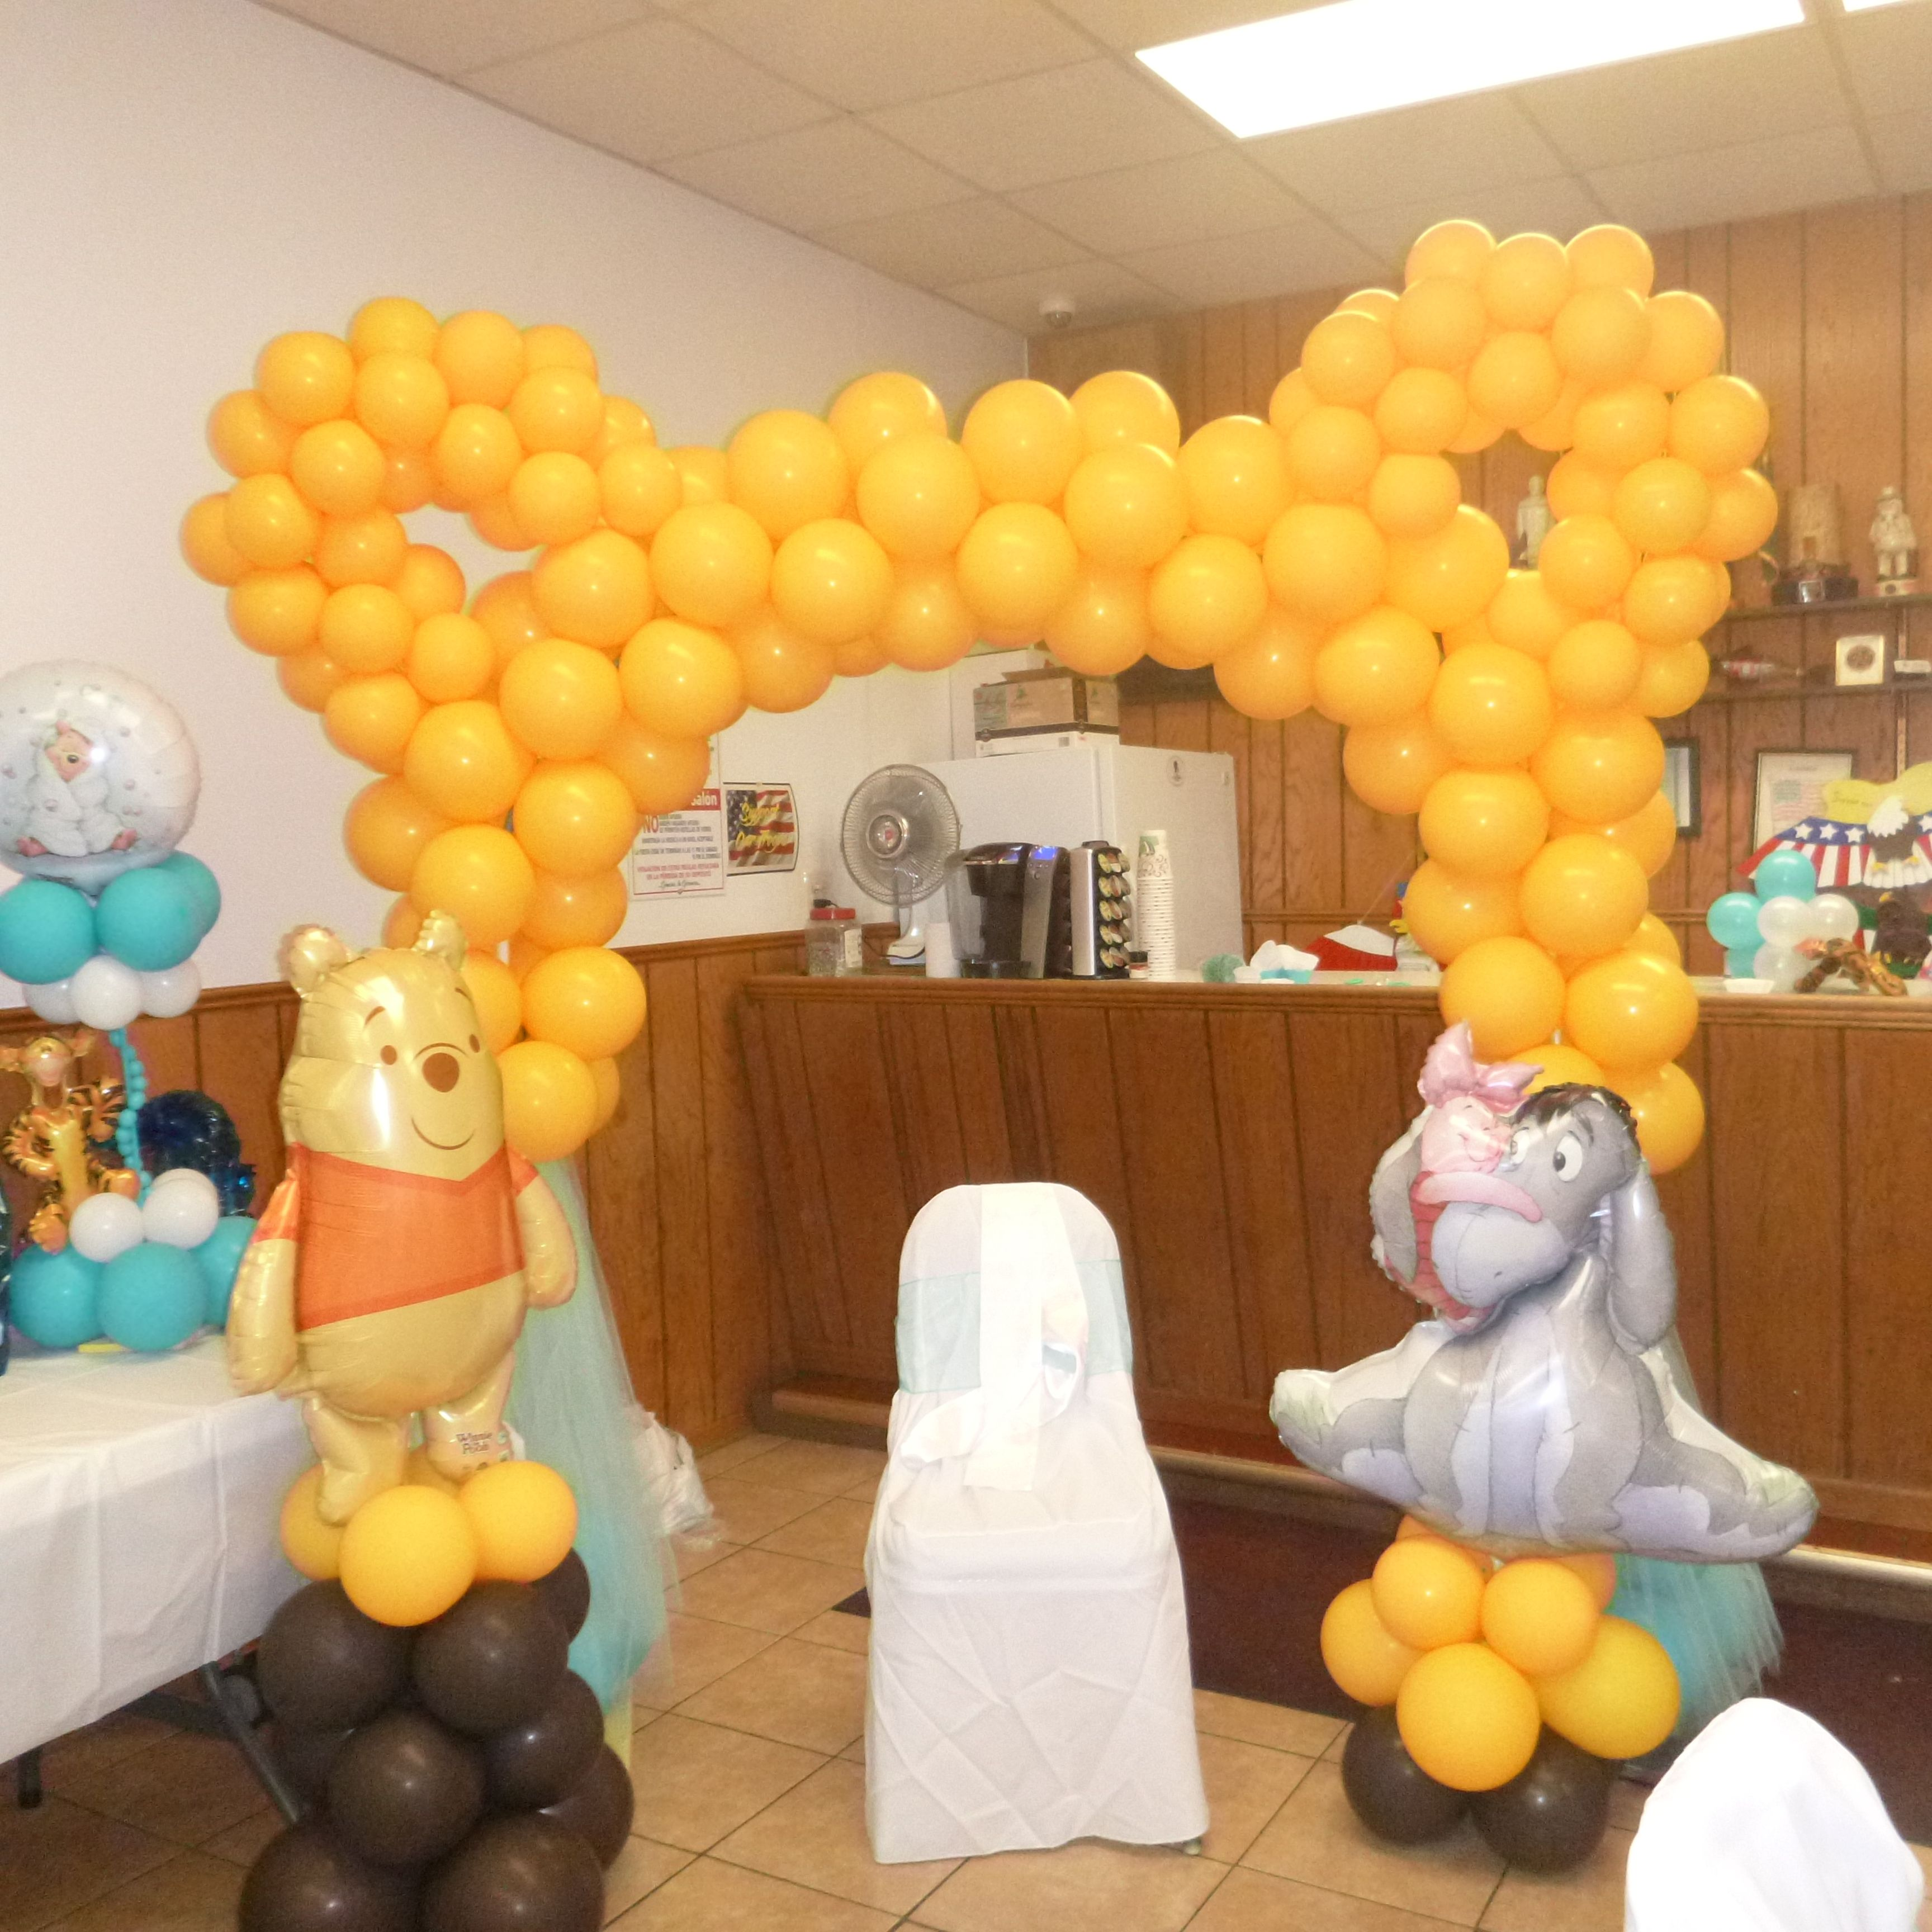 rosielloons baby shower balloons decor Pinterest